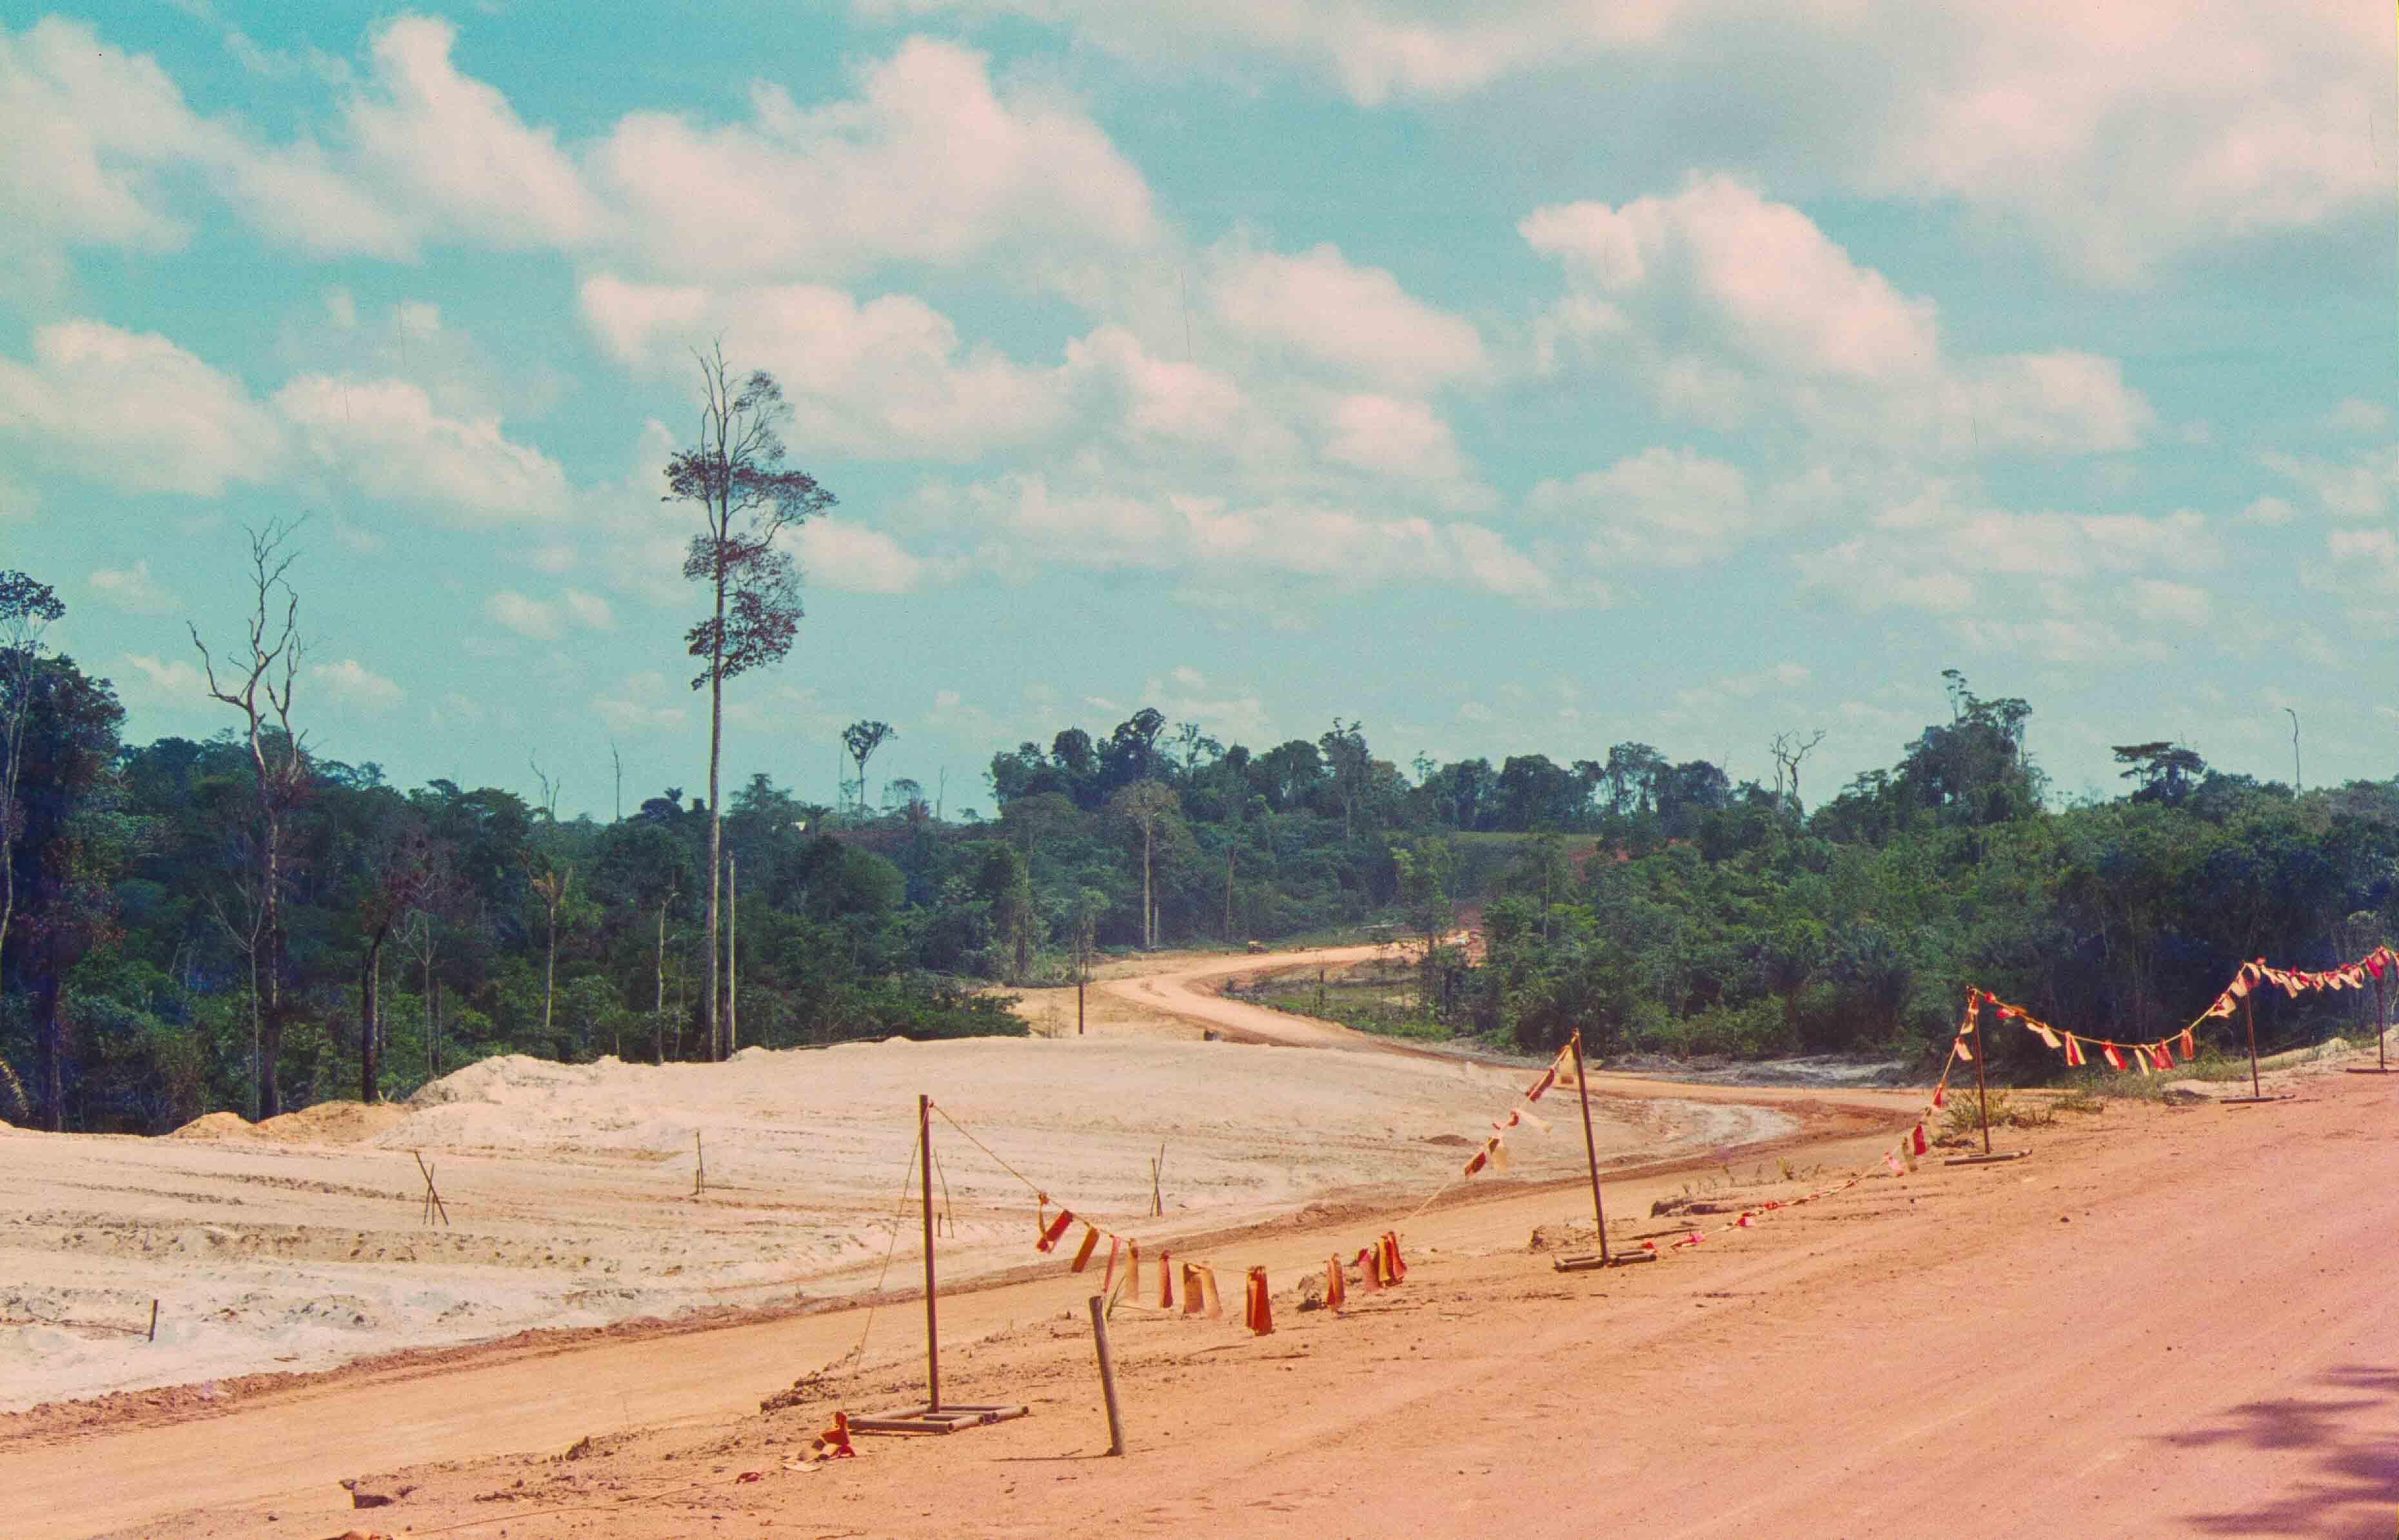 367. Suriname